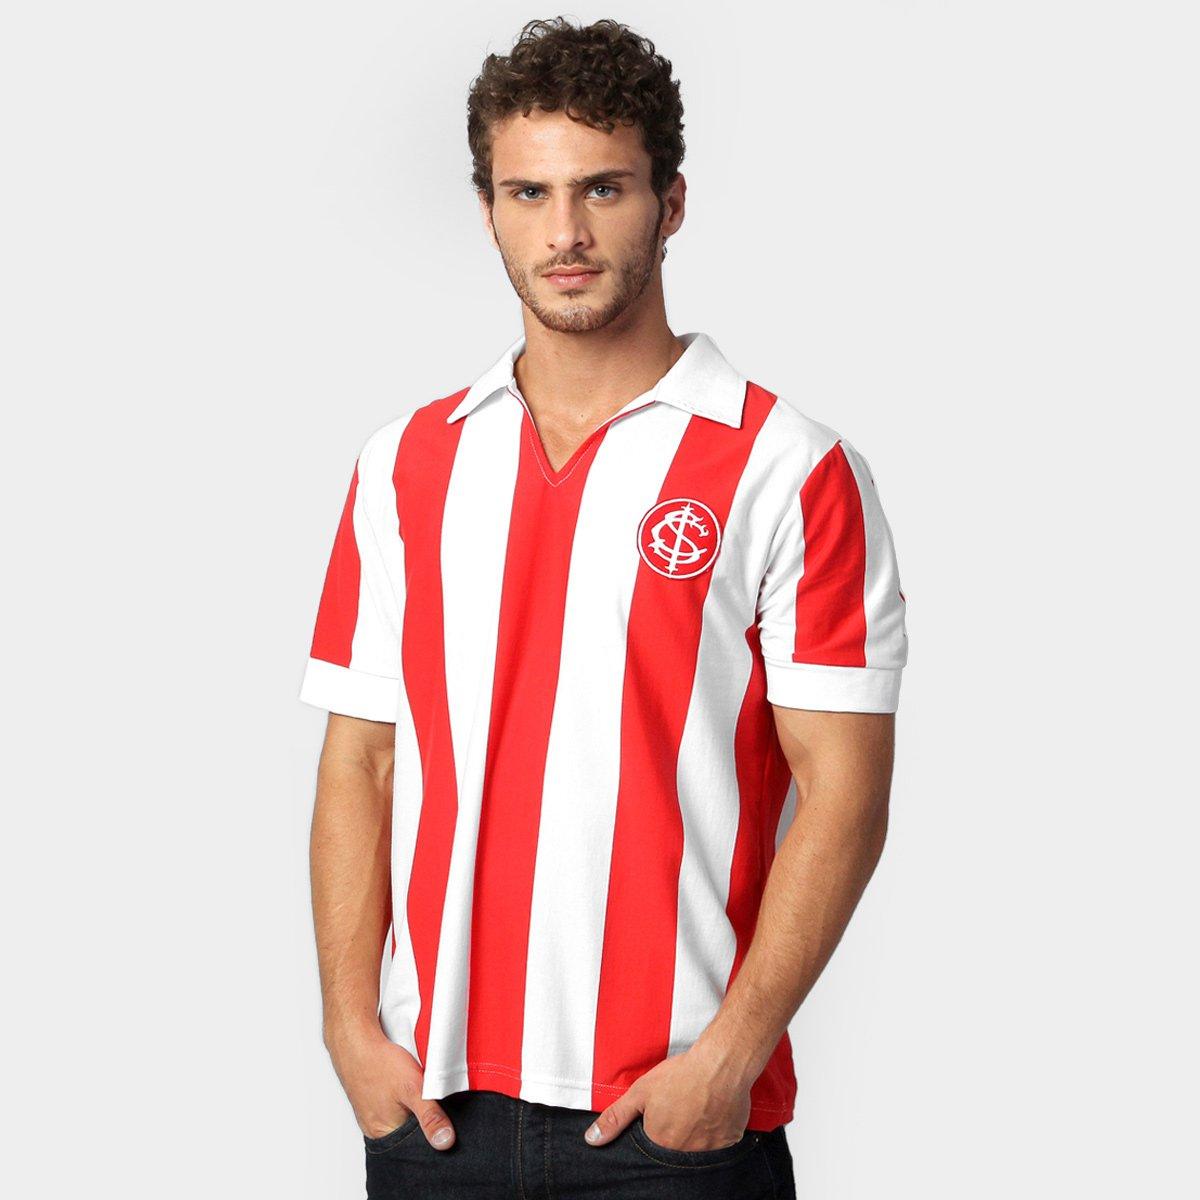 Camisa Polo Internacional Listrada 1912 - Compre Agora  943df166ba9e8